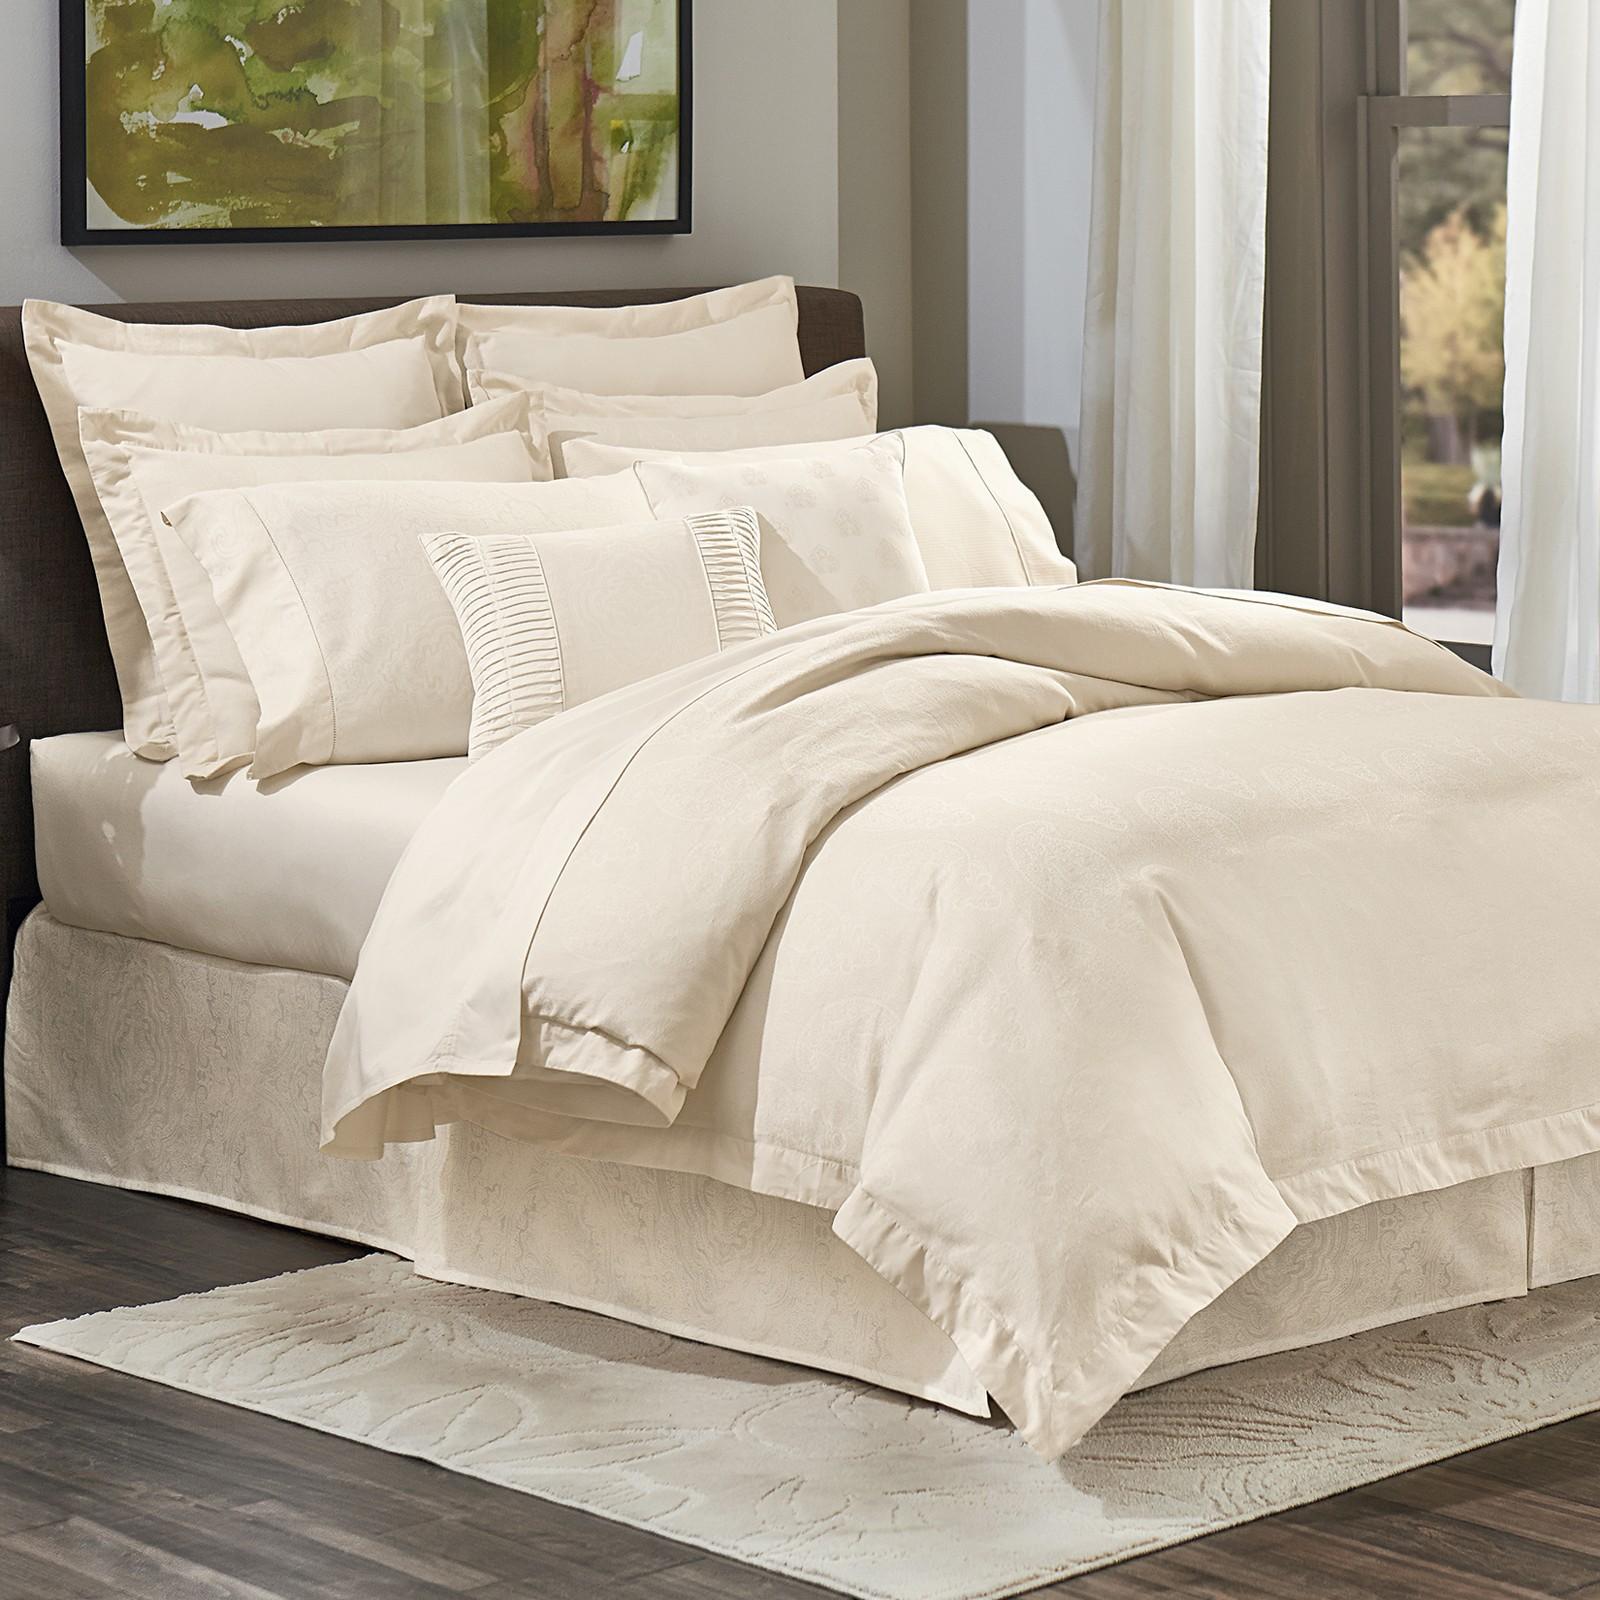 Amaze by welspun cotton sheet set bedding king navy blue - Amaze By Welspun Cotton Sheet Set Bedding King Navy Blue 19